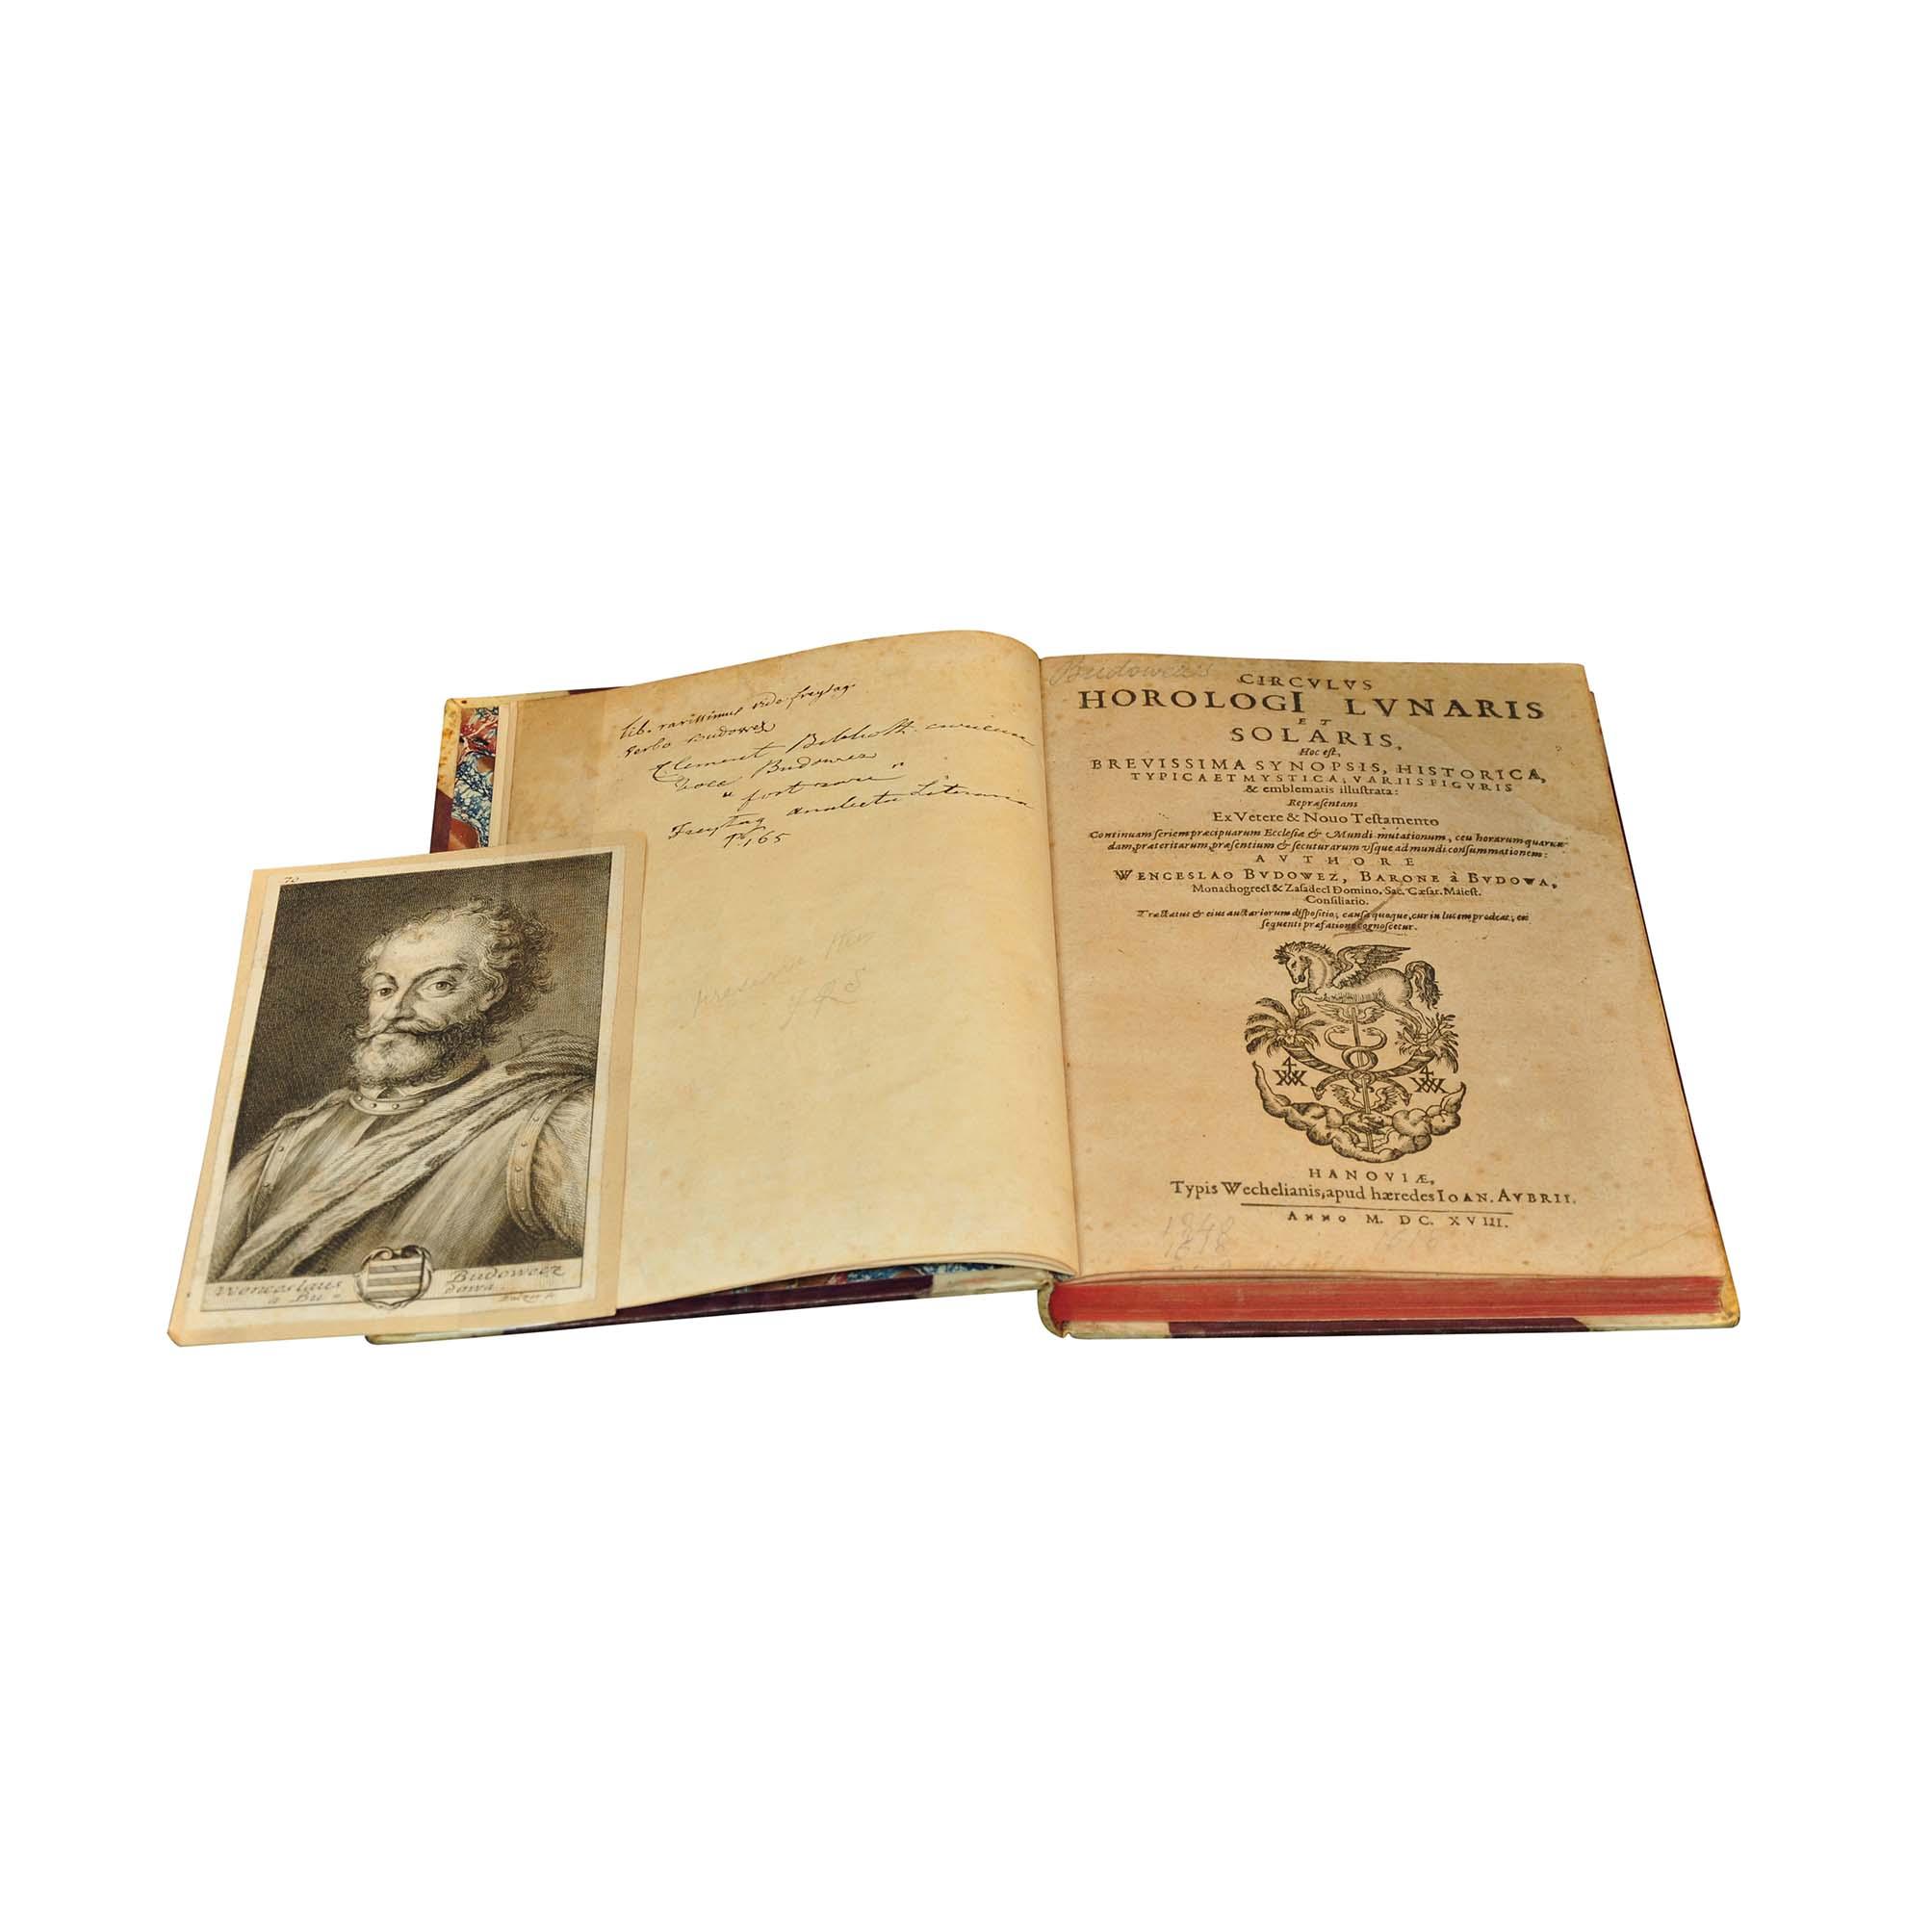 5701-Budowetz-Circulus-Horologi-Lunaris-Solaris-1616-Photo-Inscription-Cover-1-free-N.jpeg